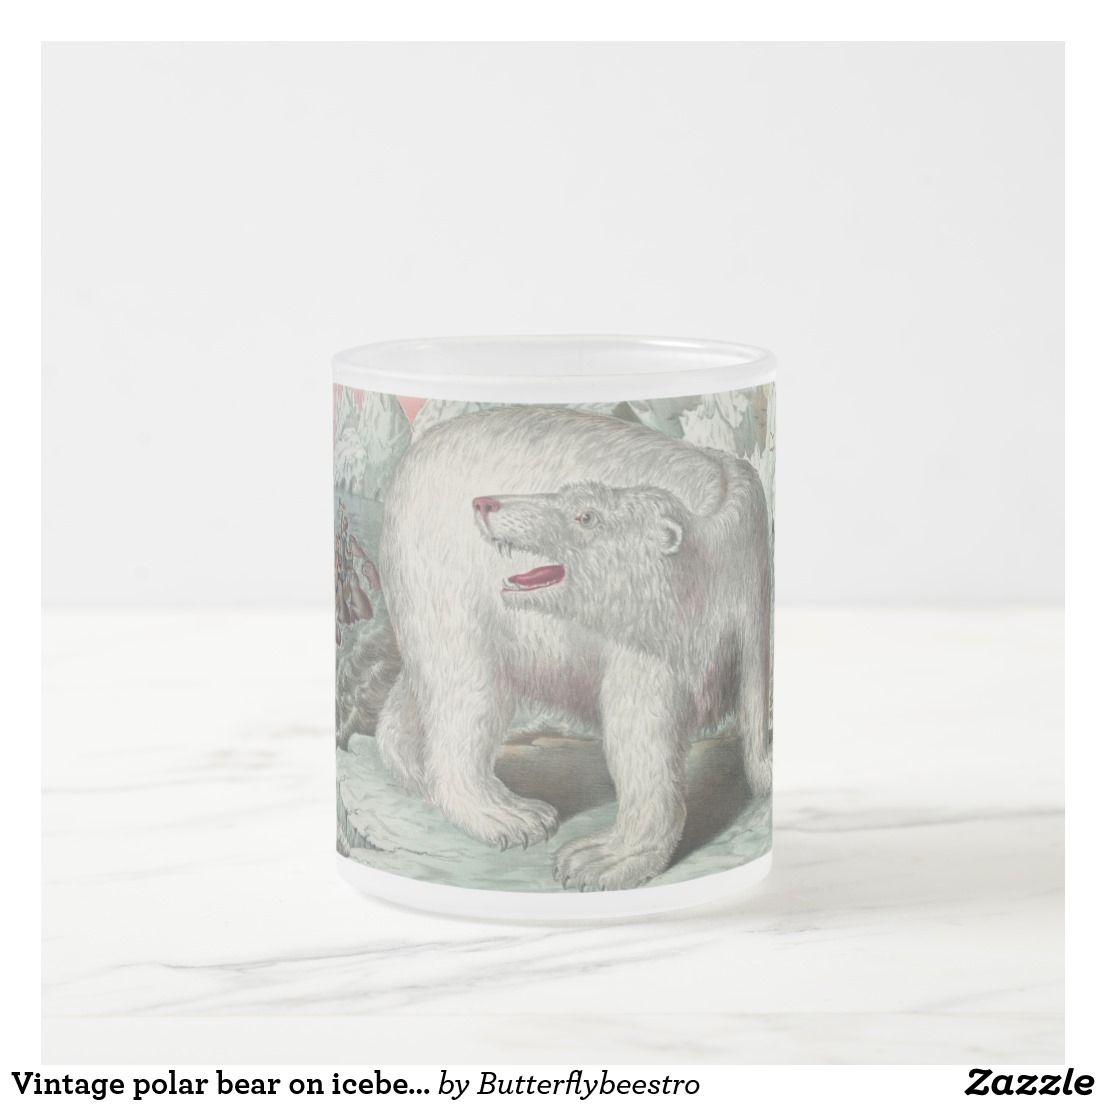 Vintage Polar Bear On Iceberg Mug Zazzle Com Vintage Painting Polar Bear Vintage [ 1106 x 1106 Pixel ]